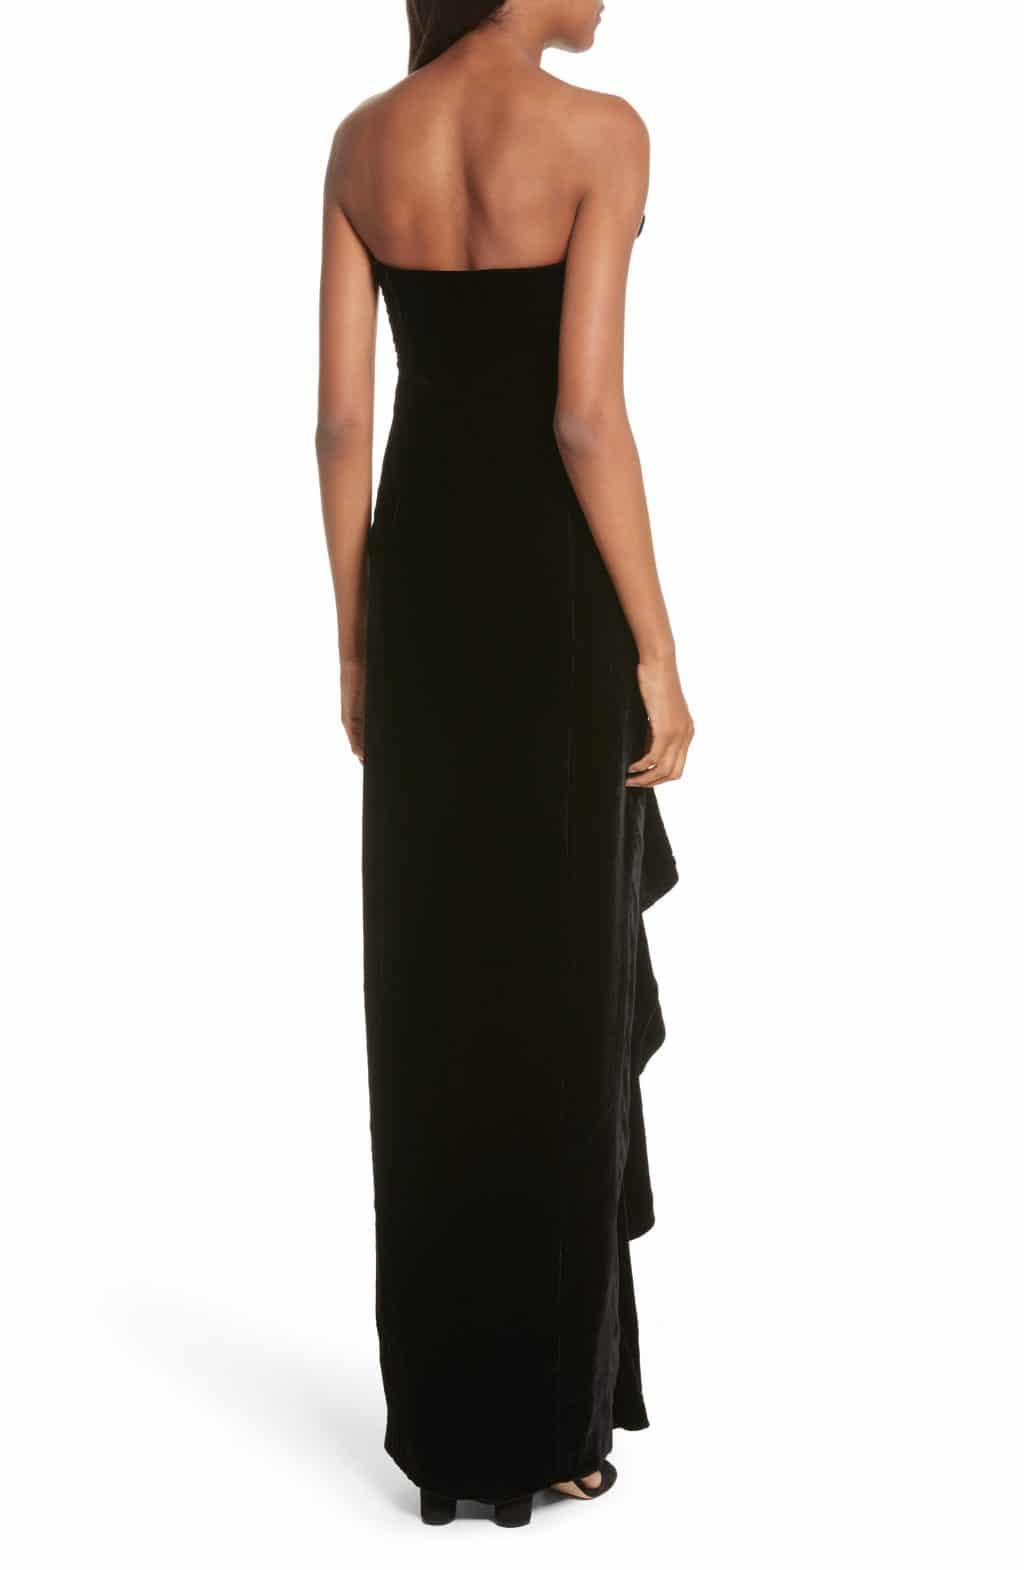 CINQ À SEPT Annoziata Strapless Velvet Black Gown - We Select Dresses